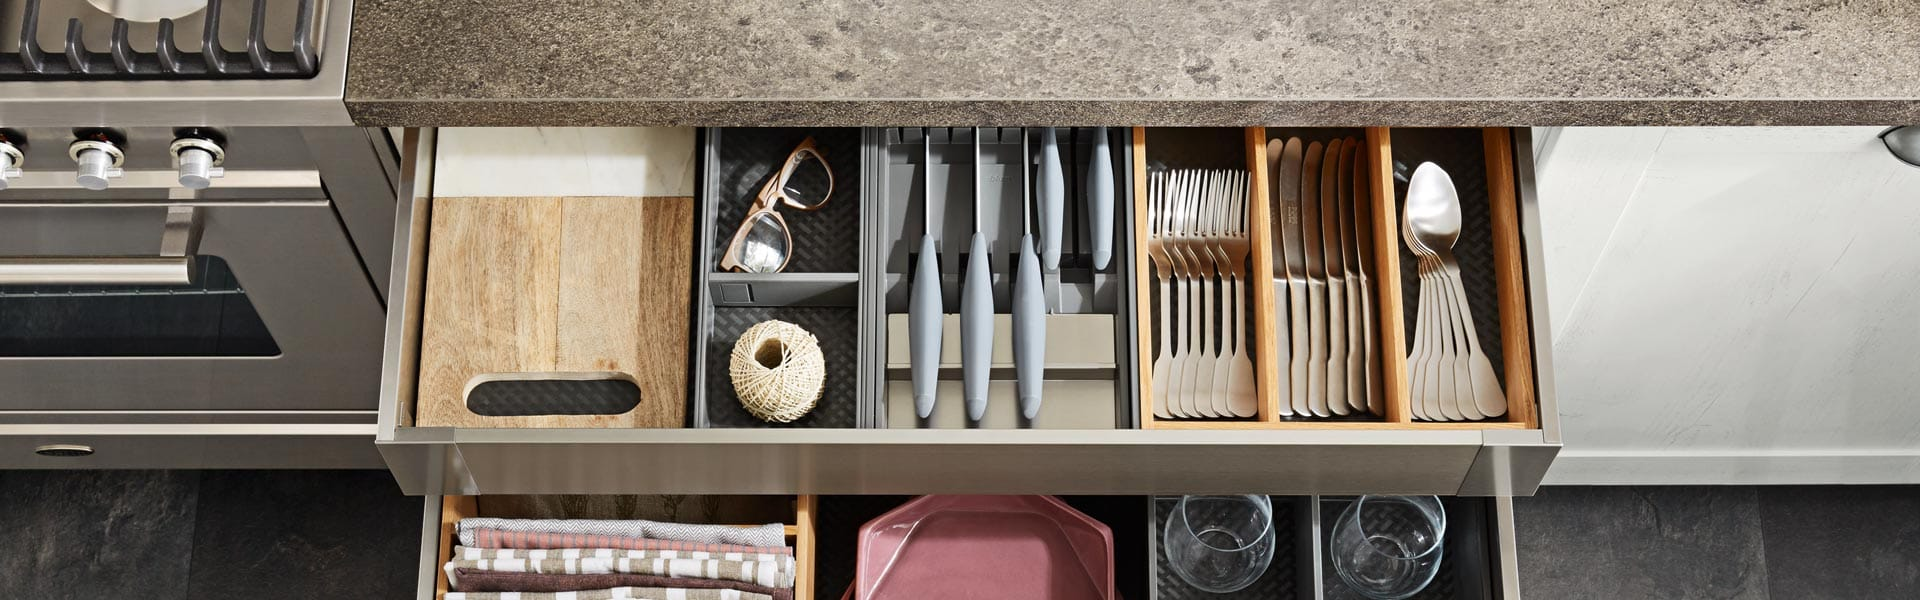 Service en kwaliteit   Eigenhuis Keukens